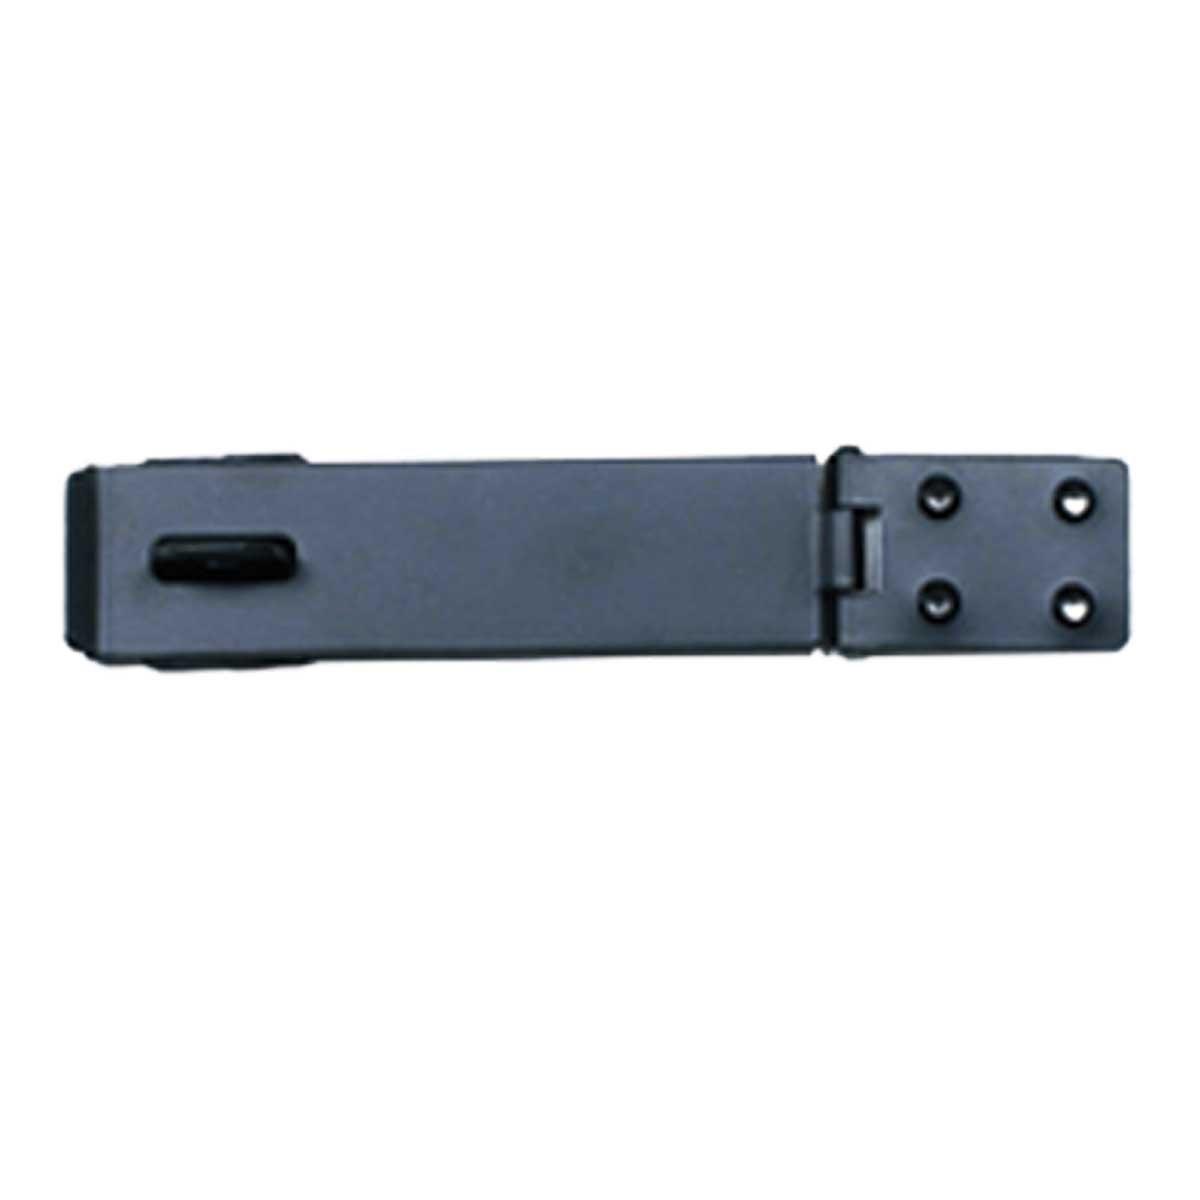 Hasp Black Cast Iron Door Gate Hasp 8 1/4'' Inch L 1 5/8'' W